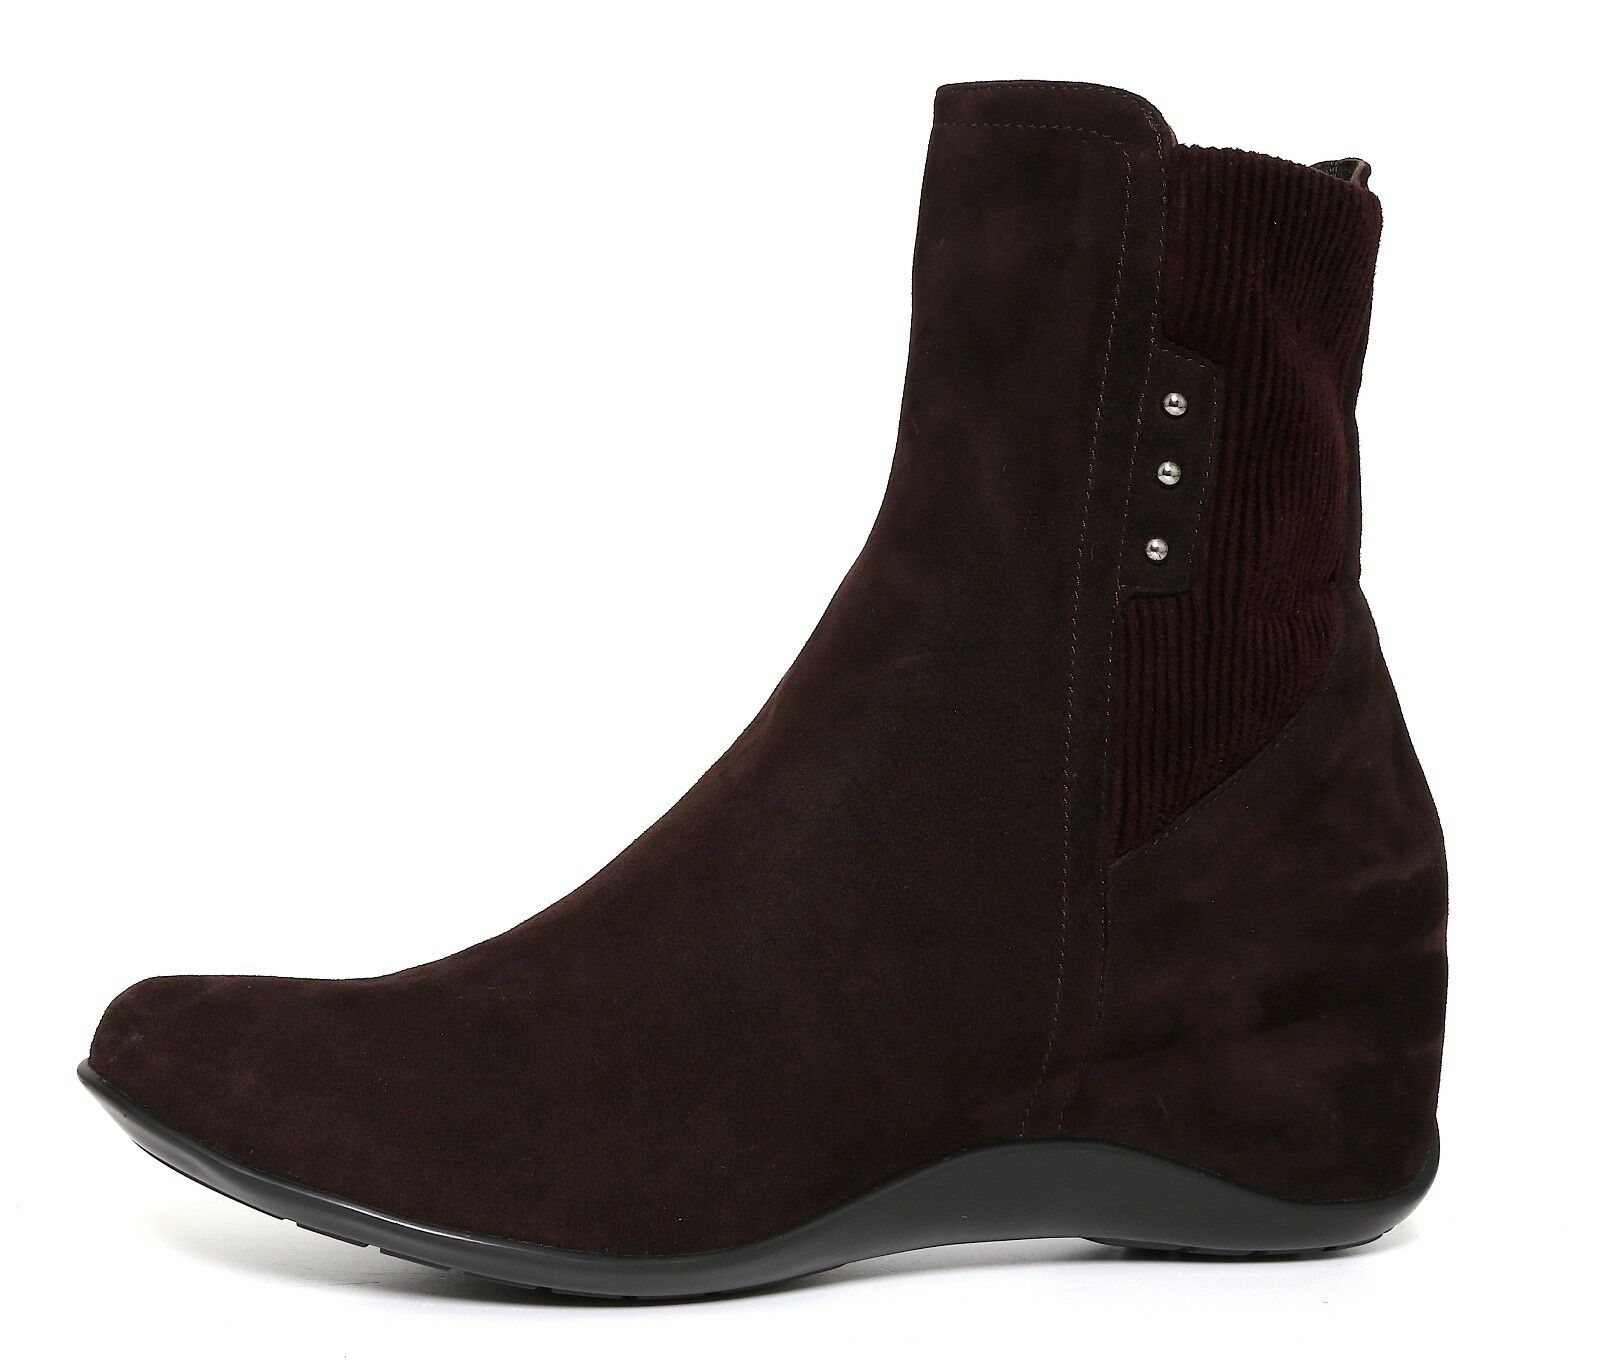 Aquatalia By Marvin K. Versus Suede Wedge Ankle Boot Brown Women Sz 10 5191